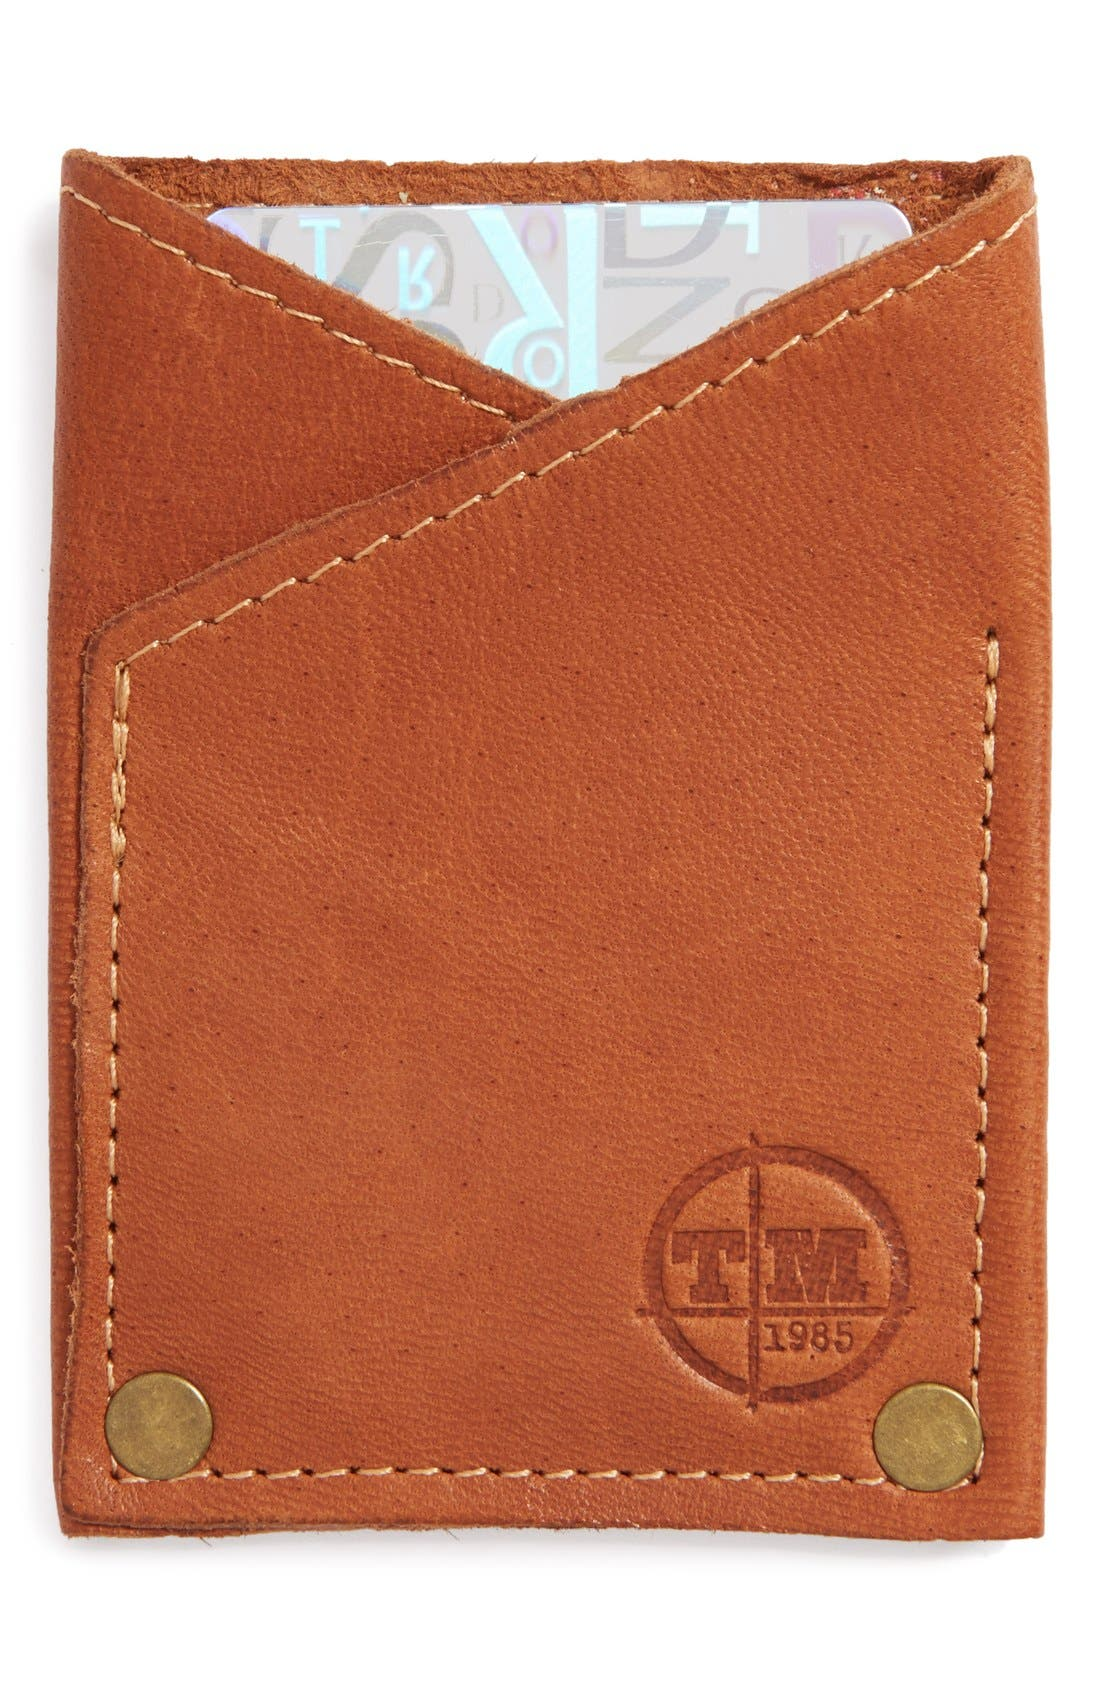 Alternate Image 1 Selected - TM1985 Card Wallet